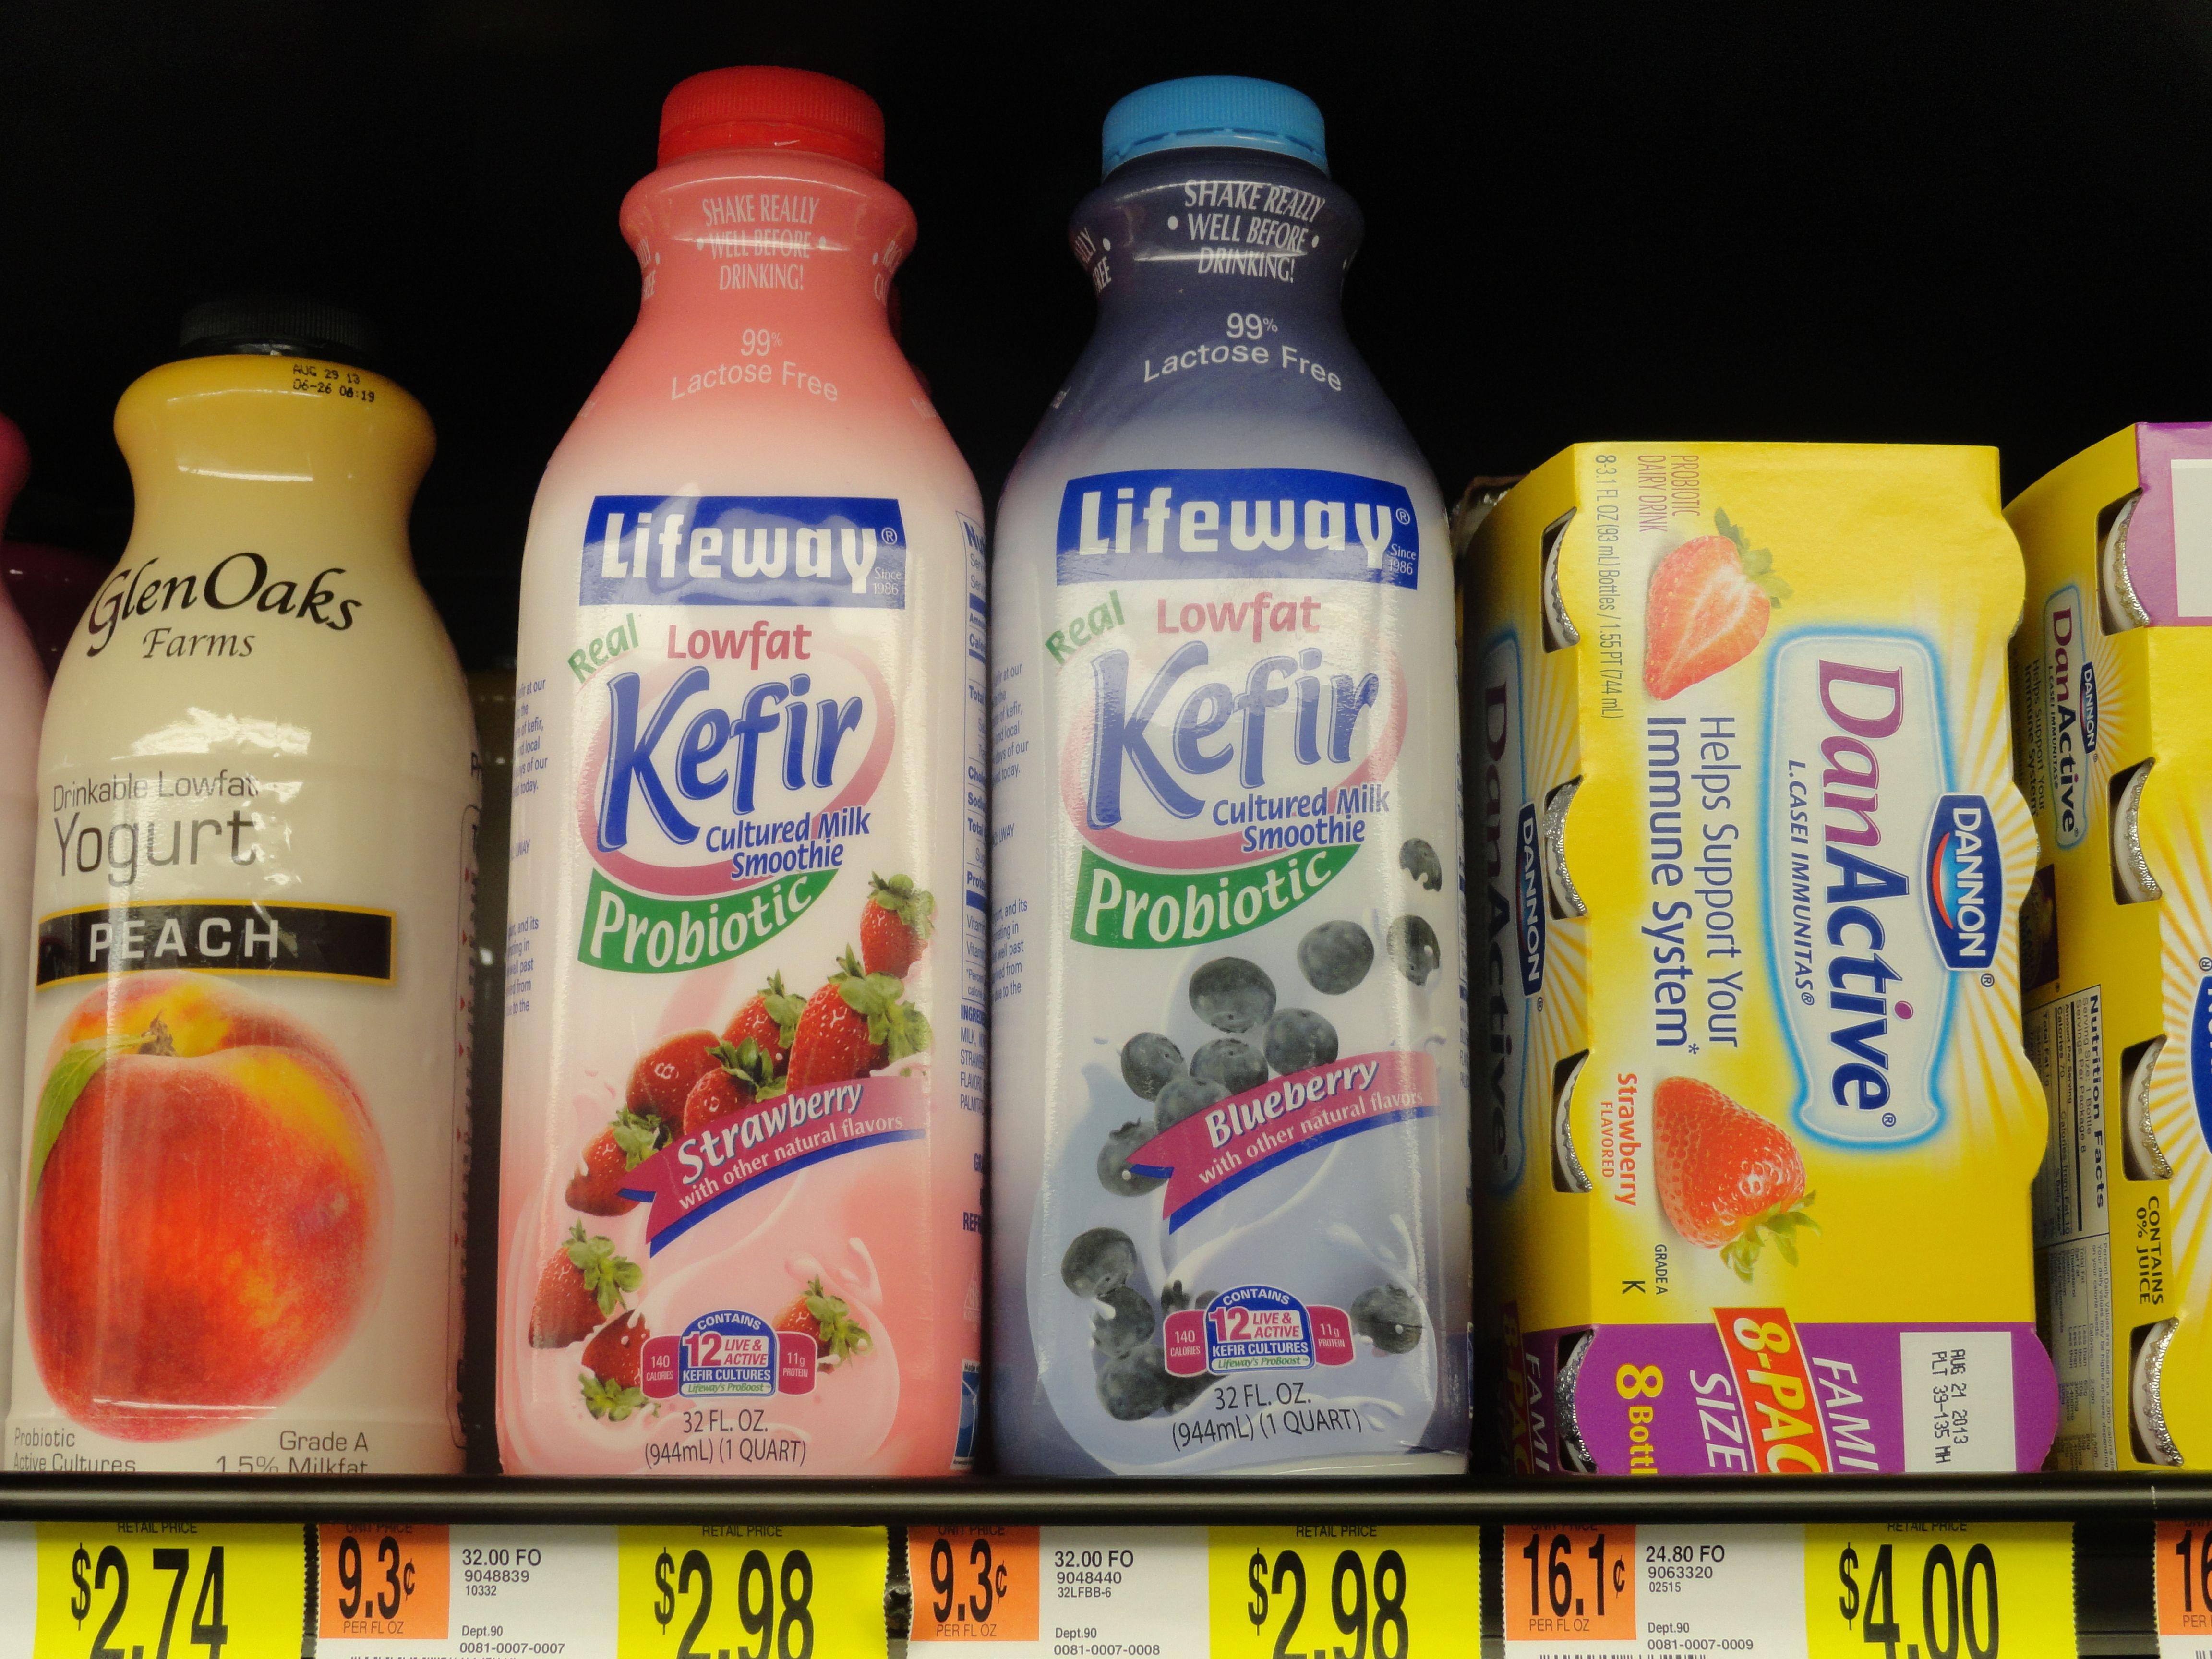 Found Lifeway Kefir At My Local Walmart Influenster Lwaysummer Dannon Yogurt Kefir Dannon